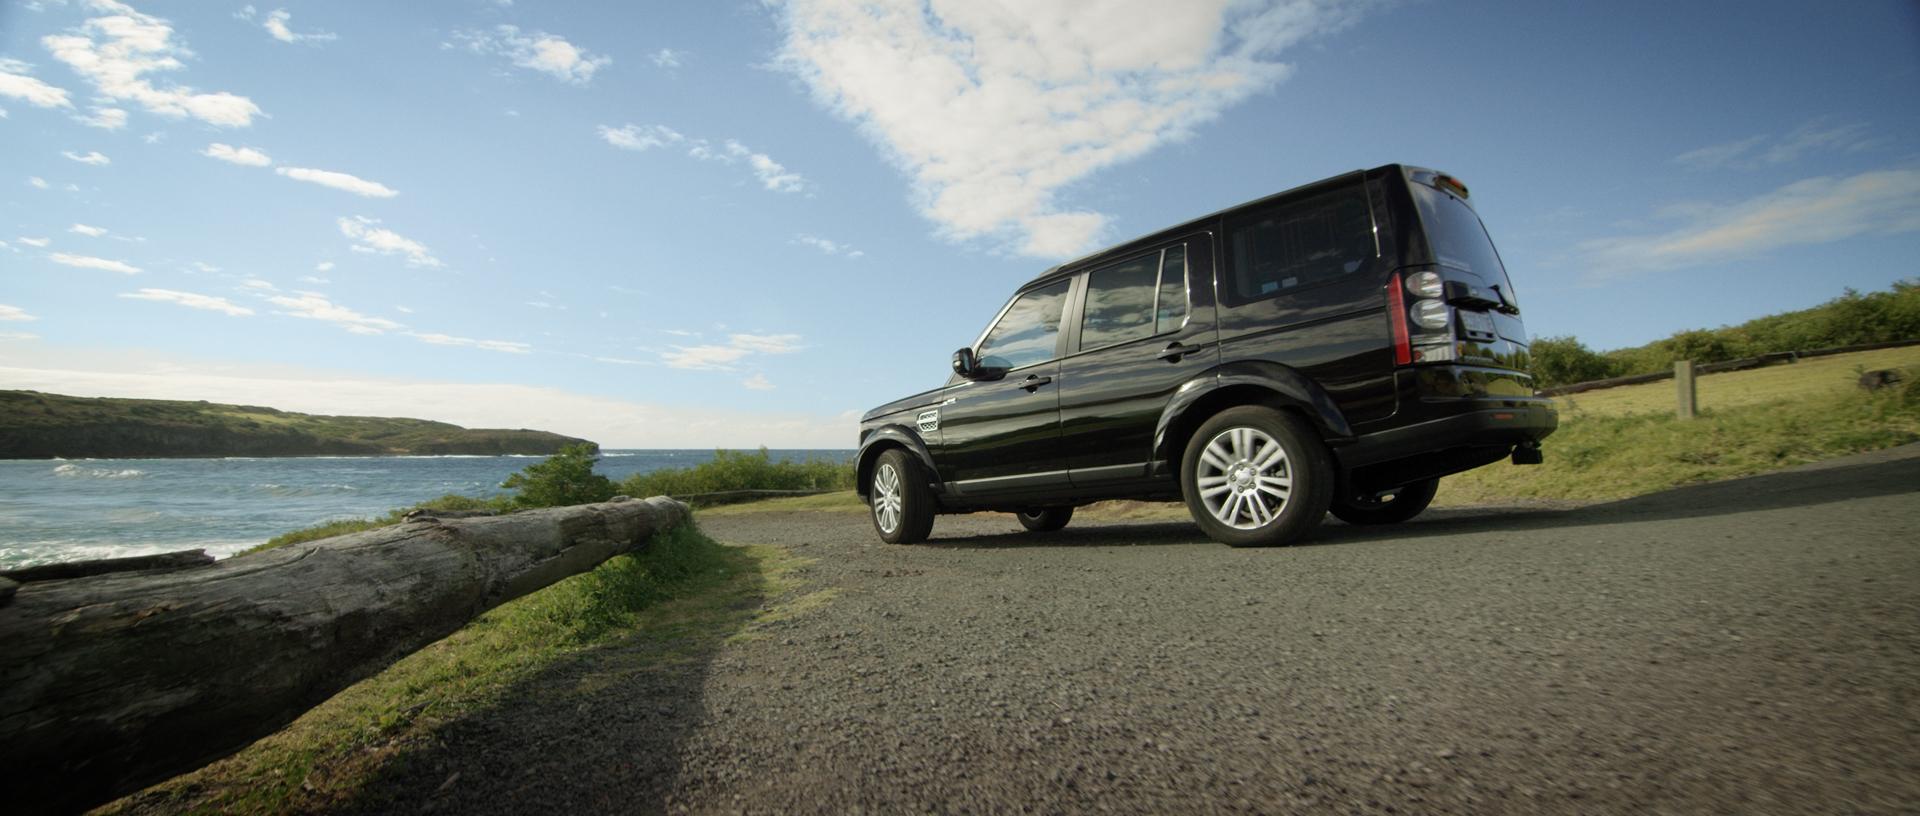 Land_Rover_Sally_Fitzgibbons_03.jpg